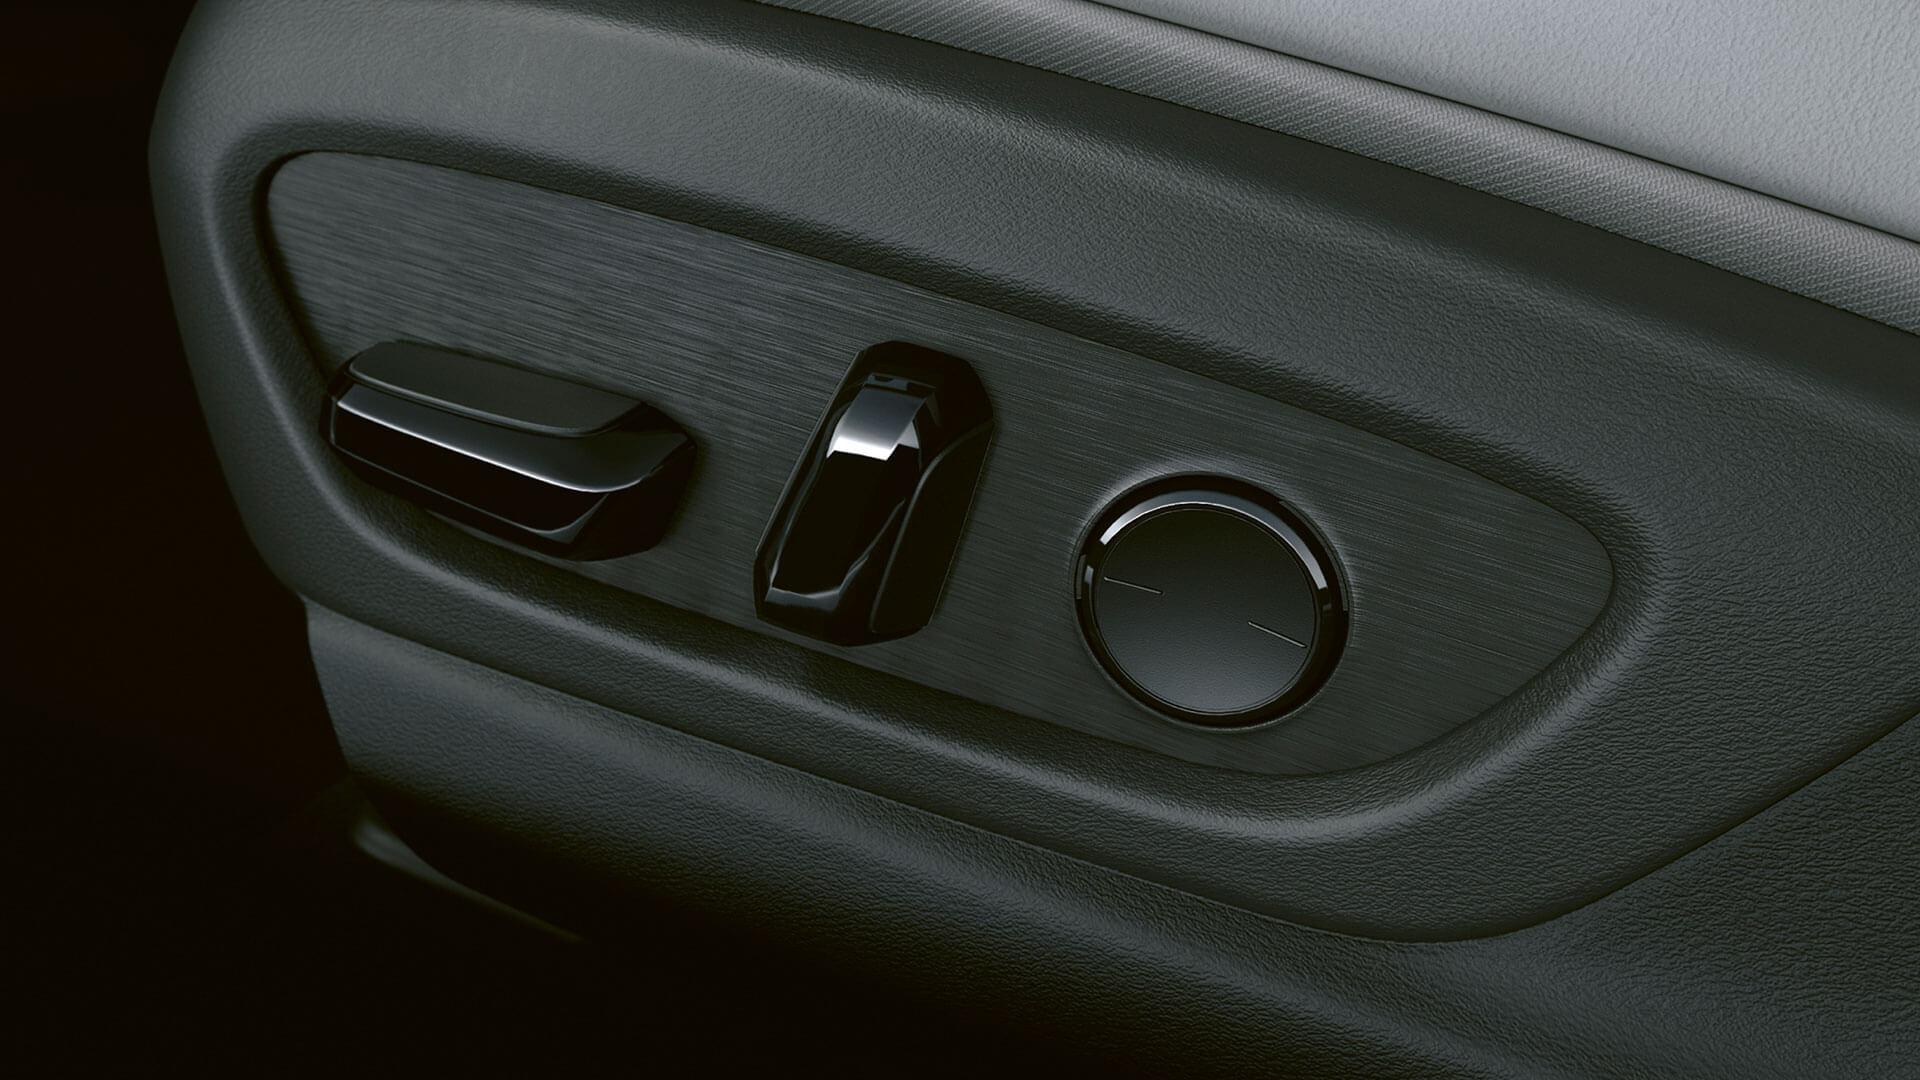 2018 lexus ux hotspot front seat adjustment